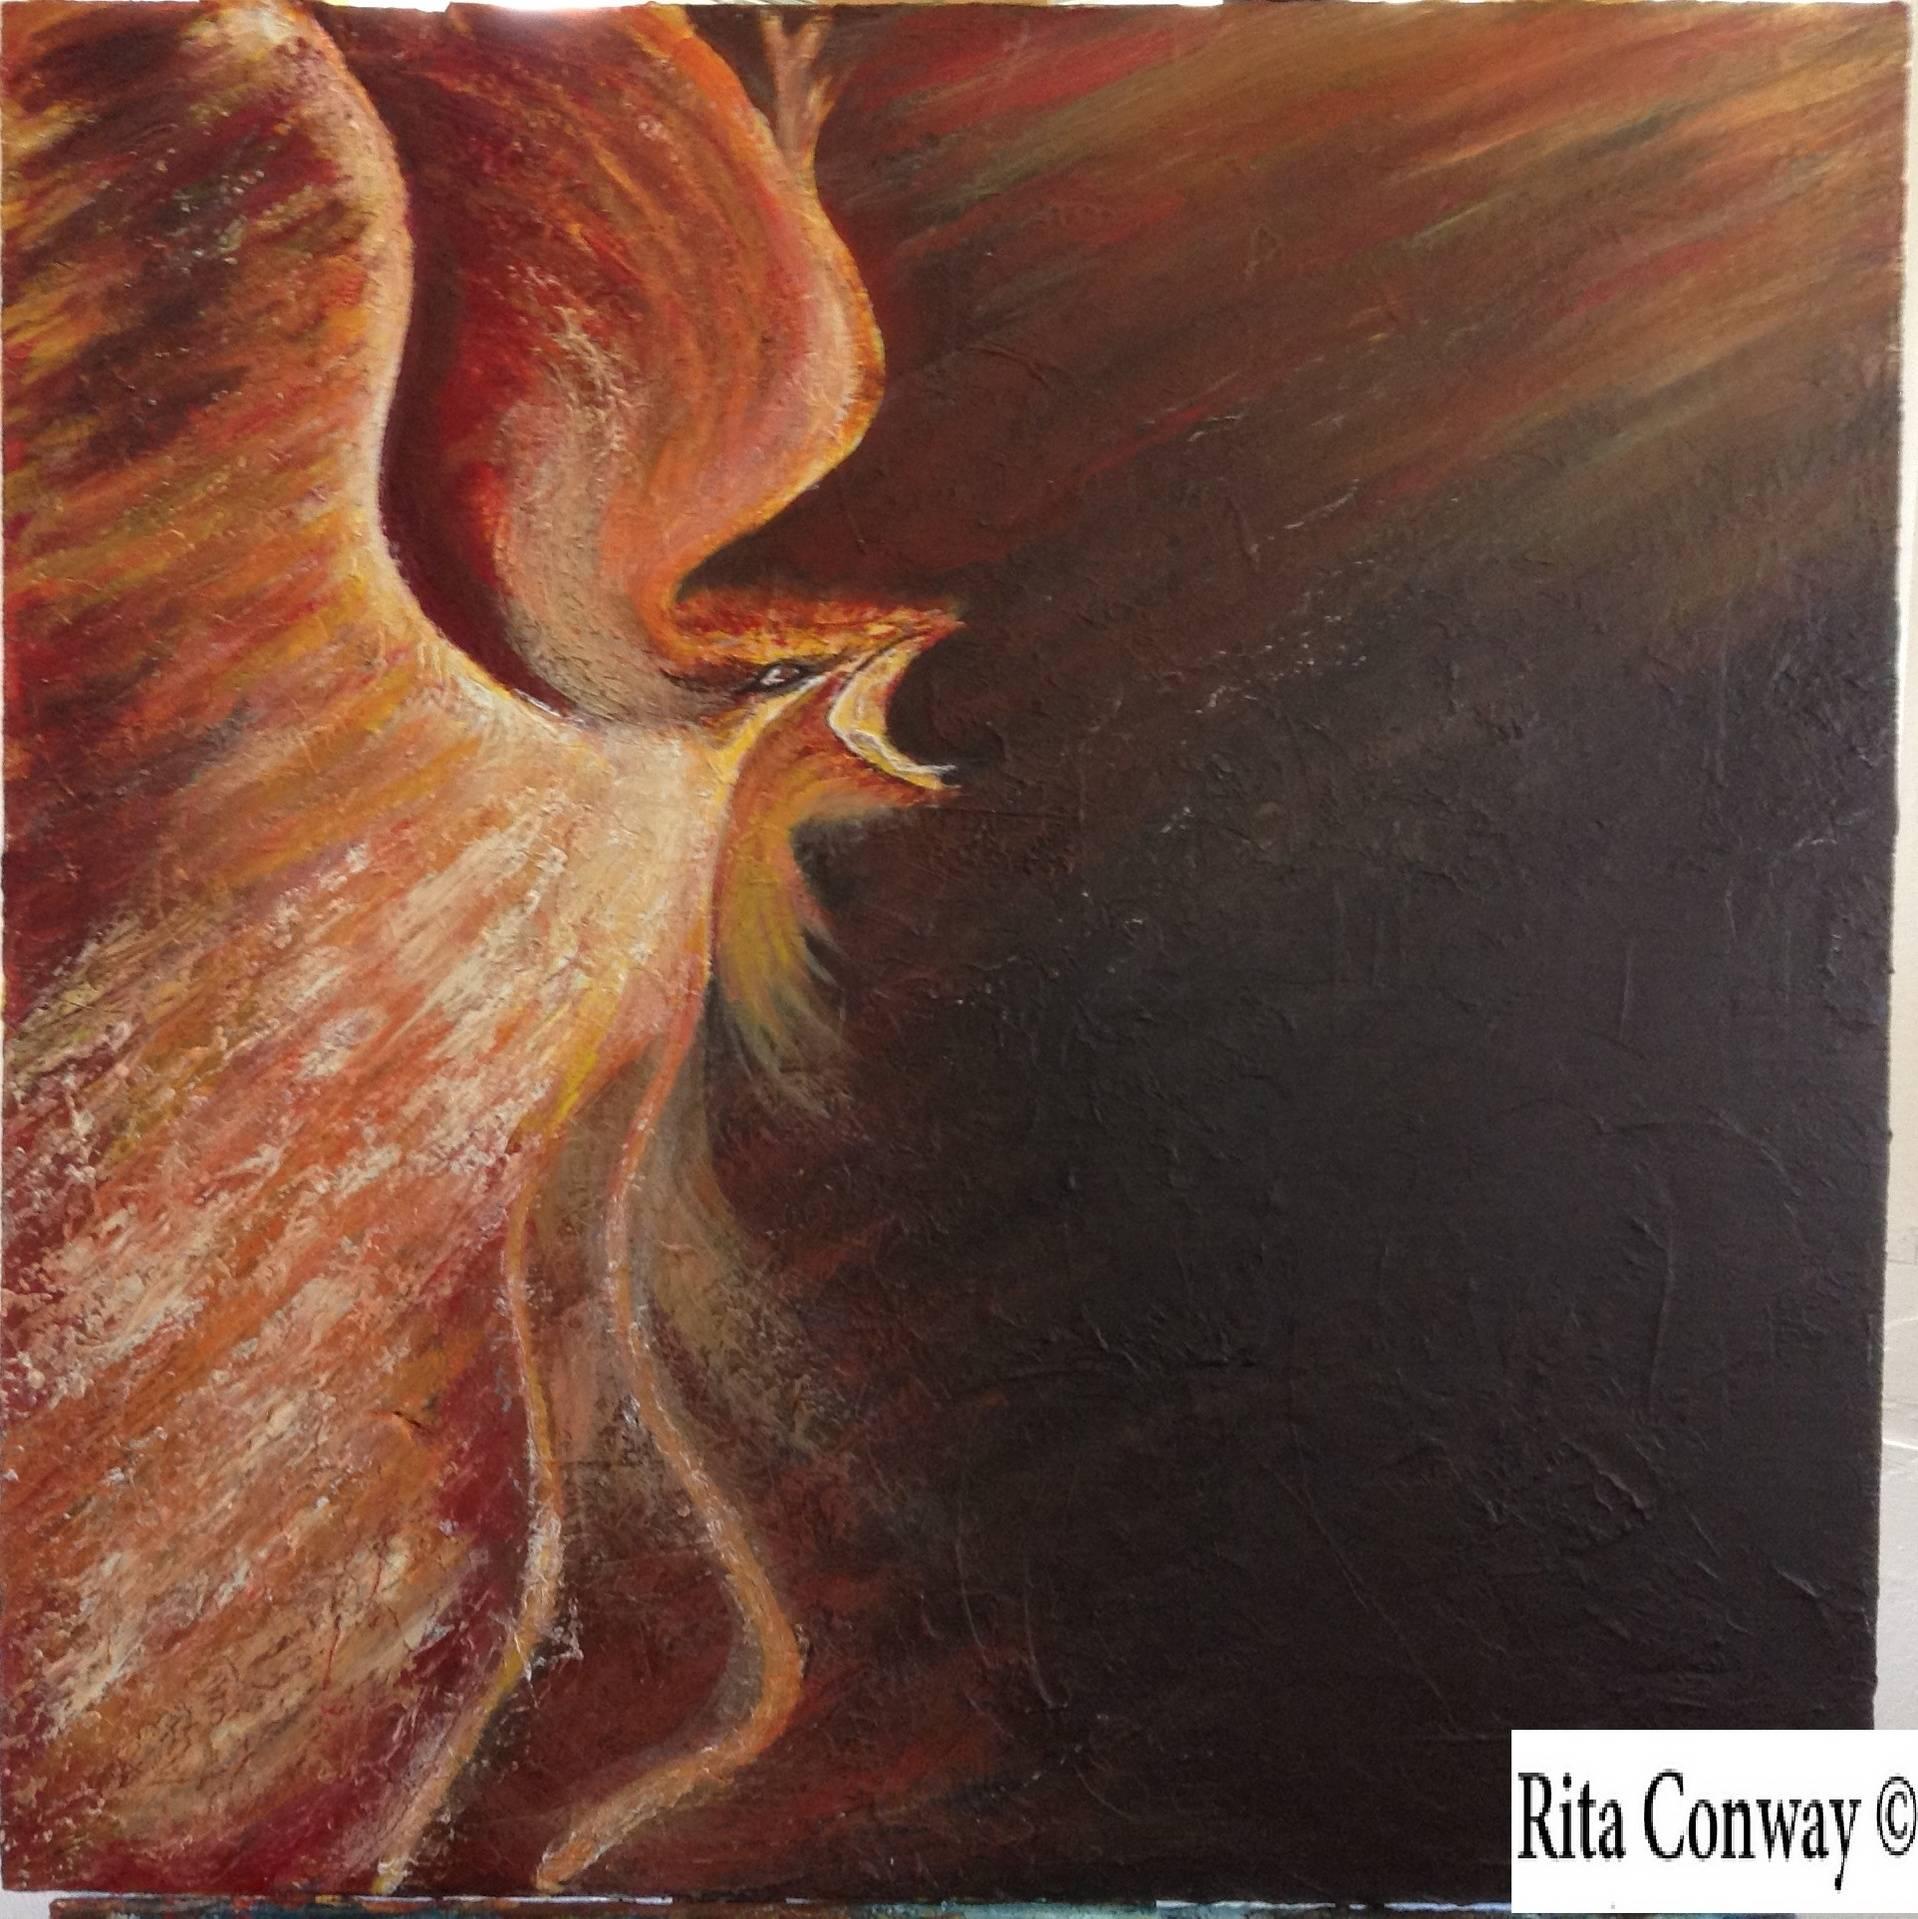 Blazed Spirit Liberation